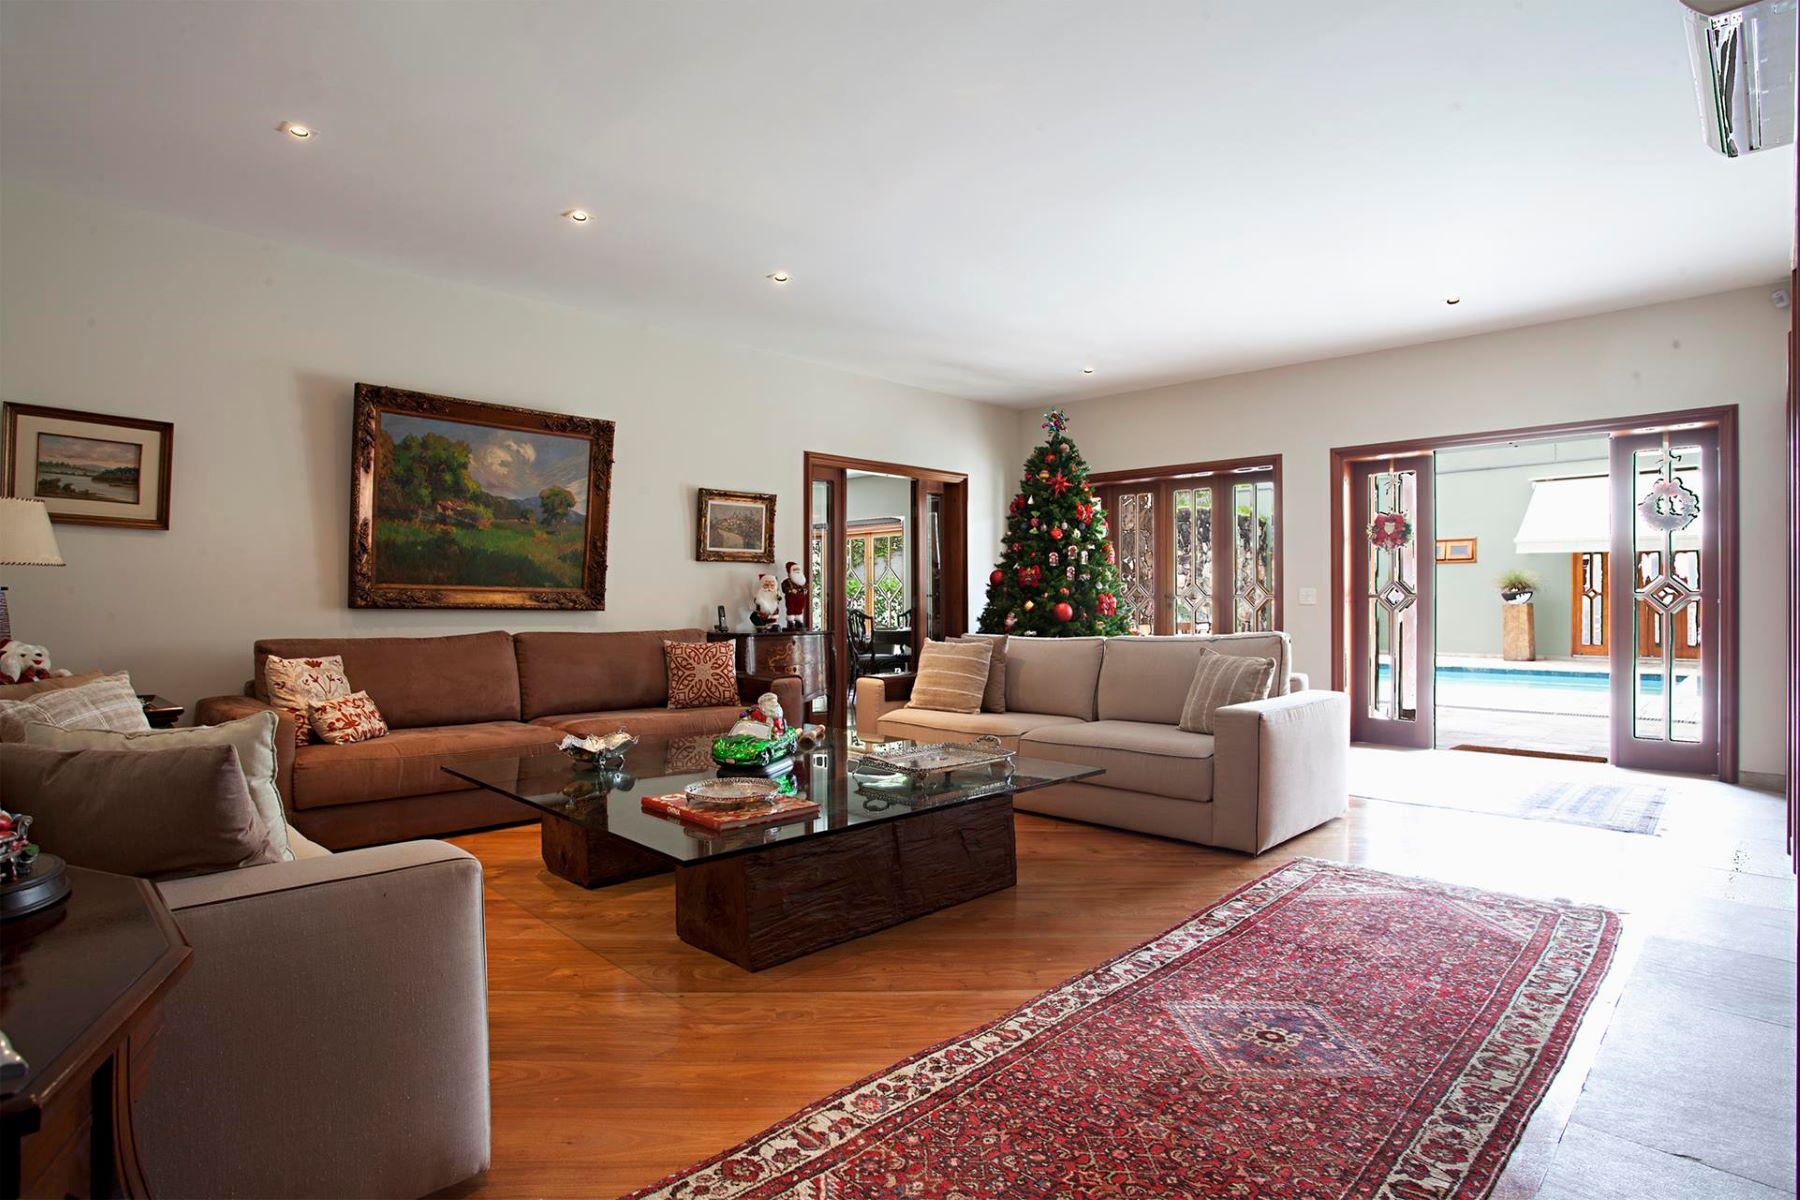 Single Family Home for Sale at One-story House with an Excellent Leisure Area Rua Gregório Paes de Almeida Sao Paulo, Sao Paulo 05450-000 Brazil